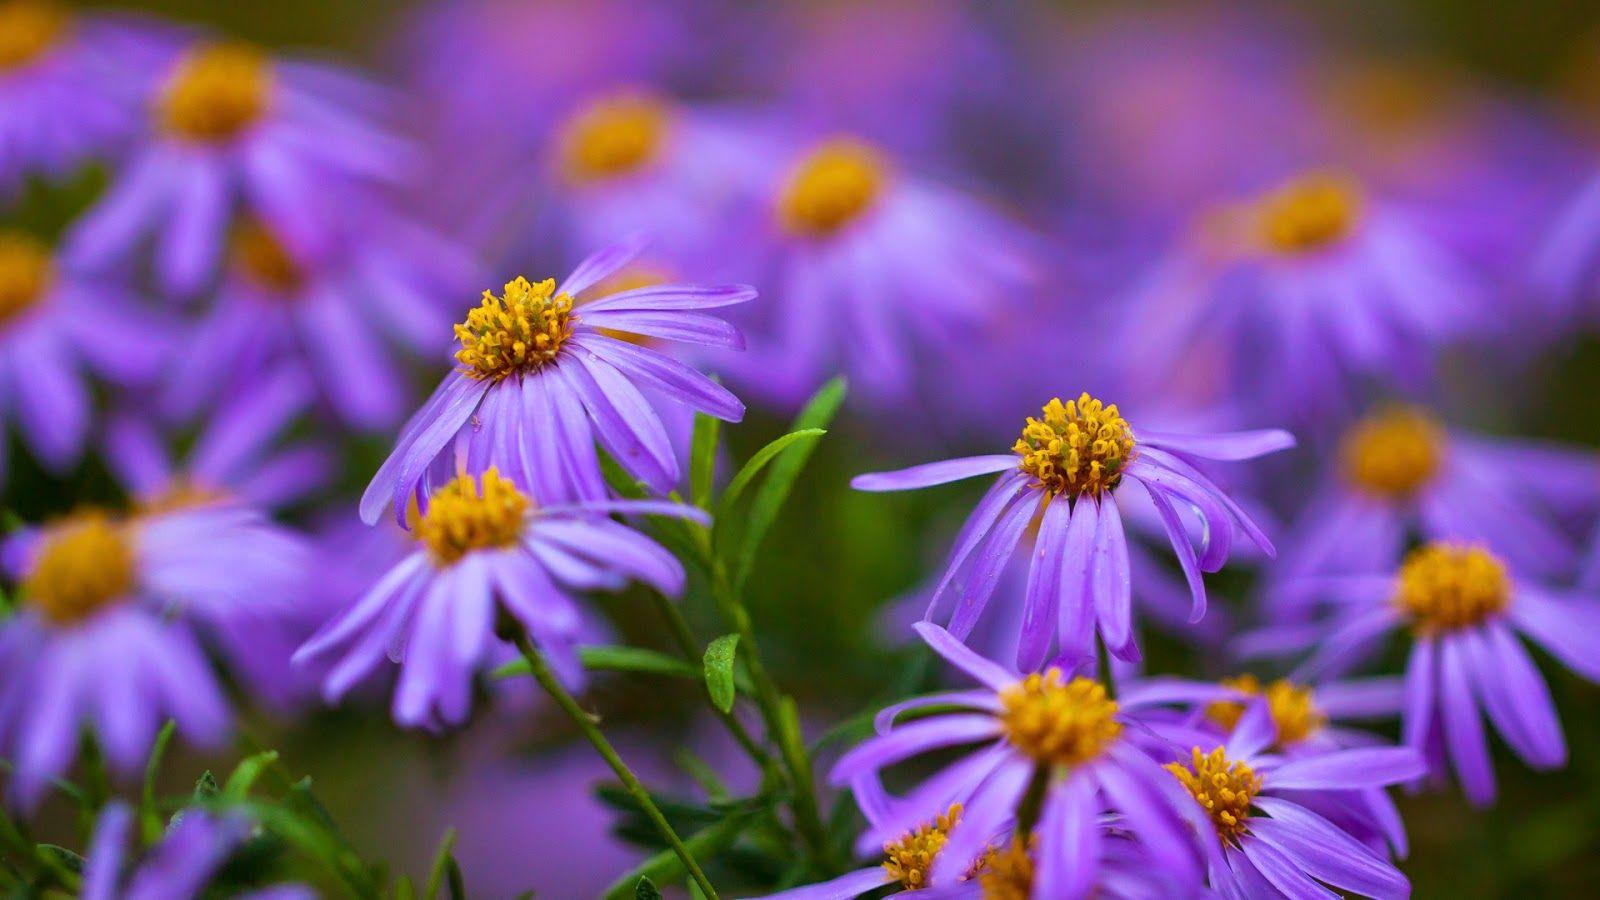 10 Gambar Bunga Warna Purple Ungu Violet Gambar Top 10